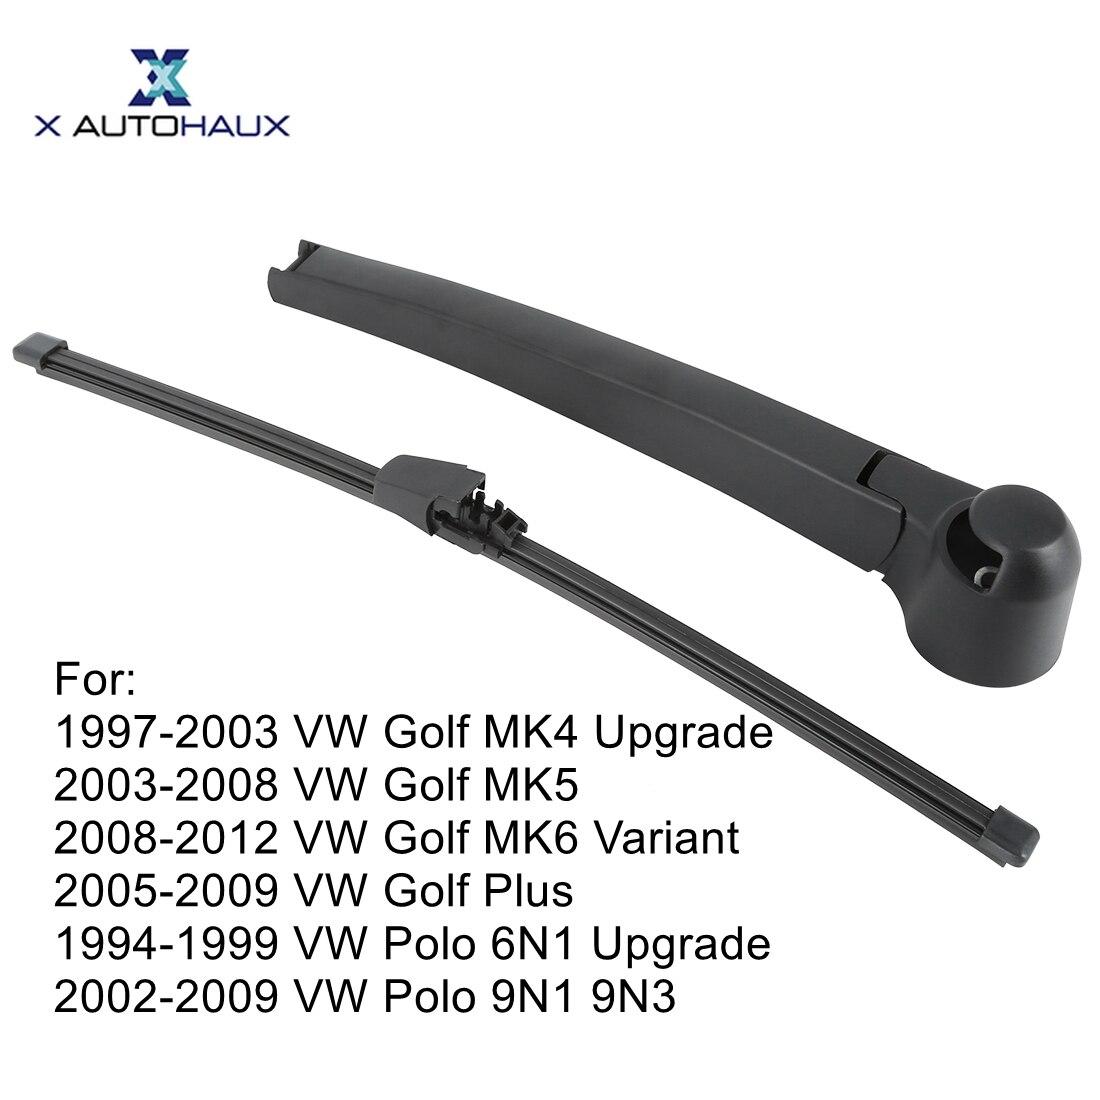 VW Fox Rear Washer Jet Nozzle 2005 2006 2007 2008 2009 2010 2011 1.2 1.4